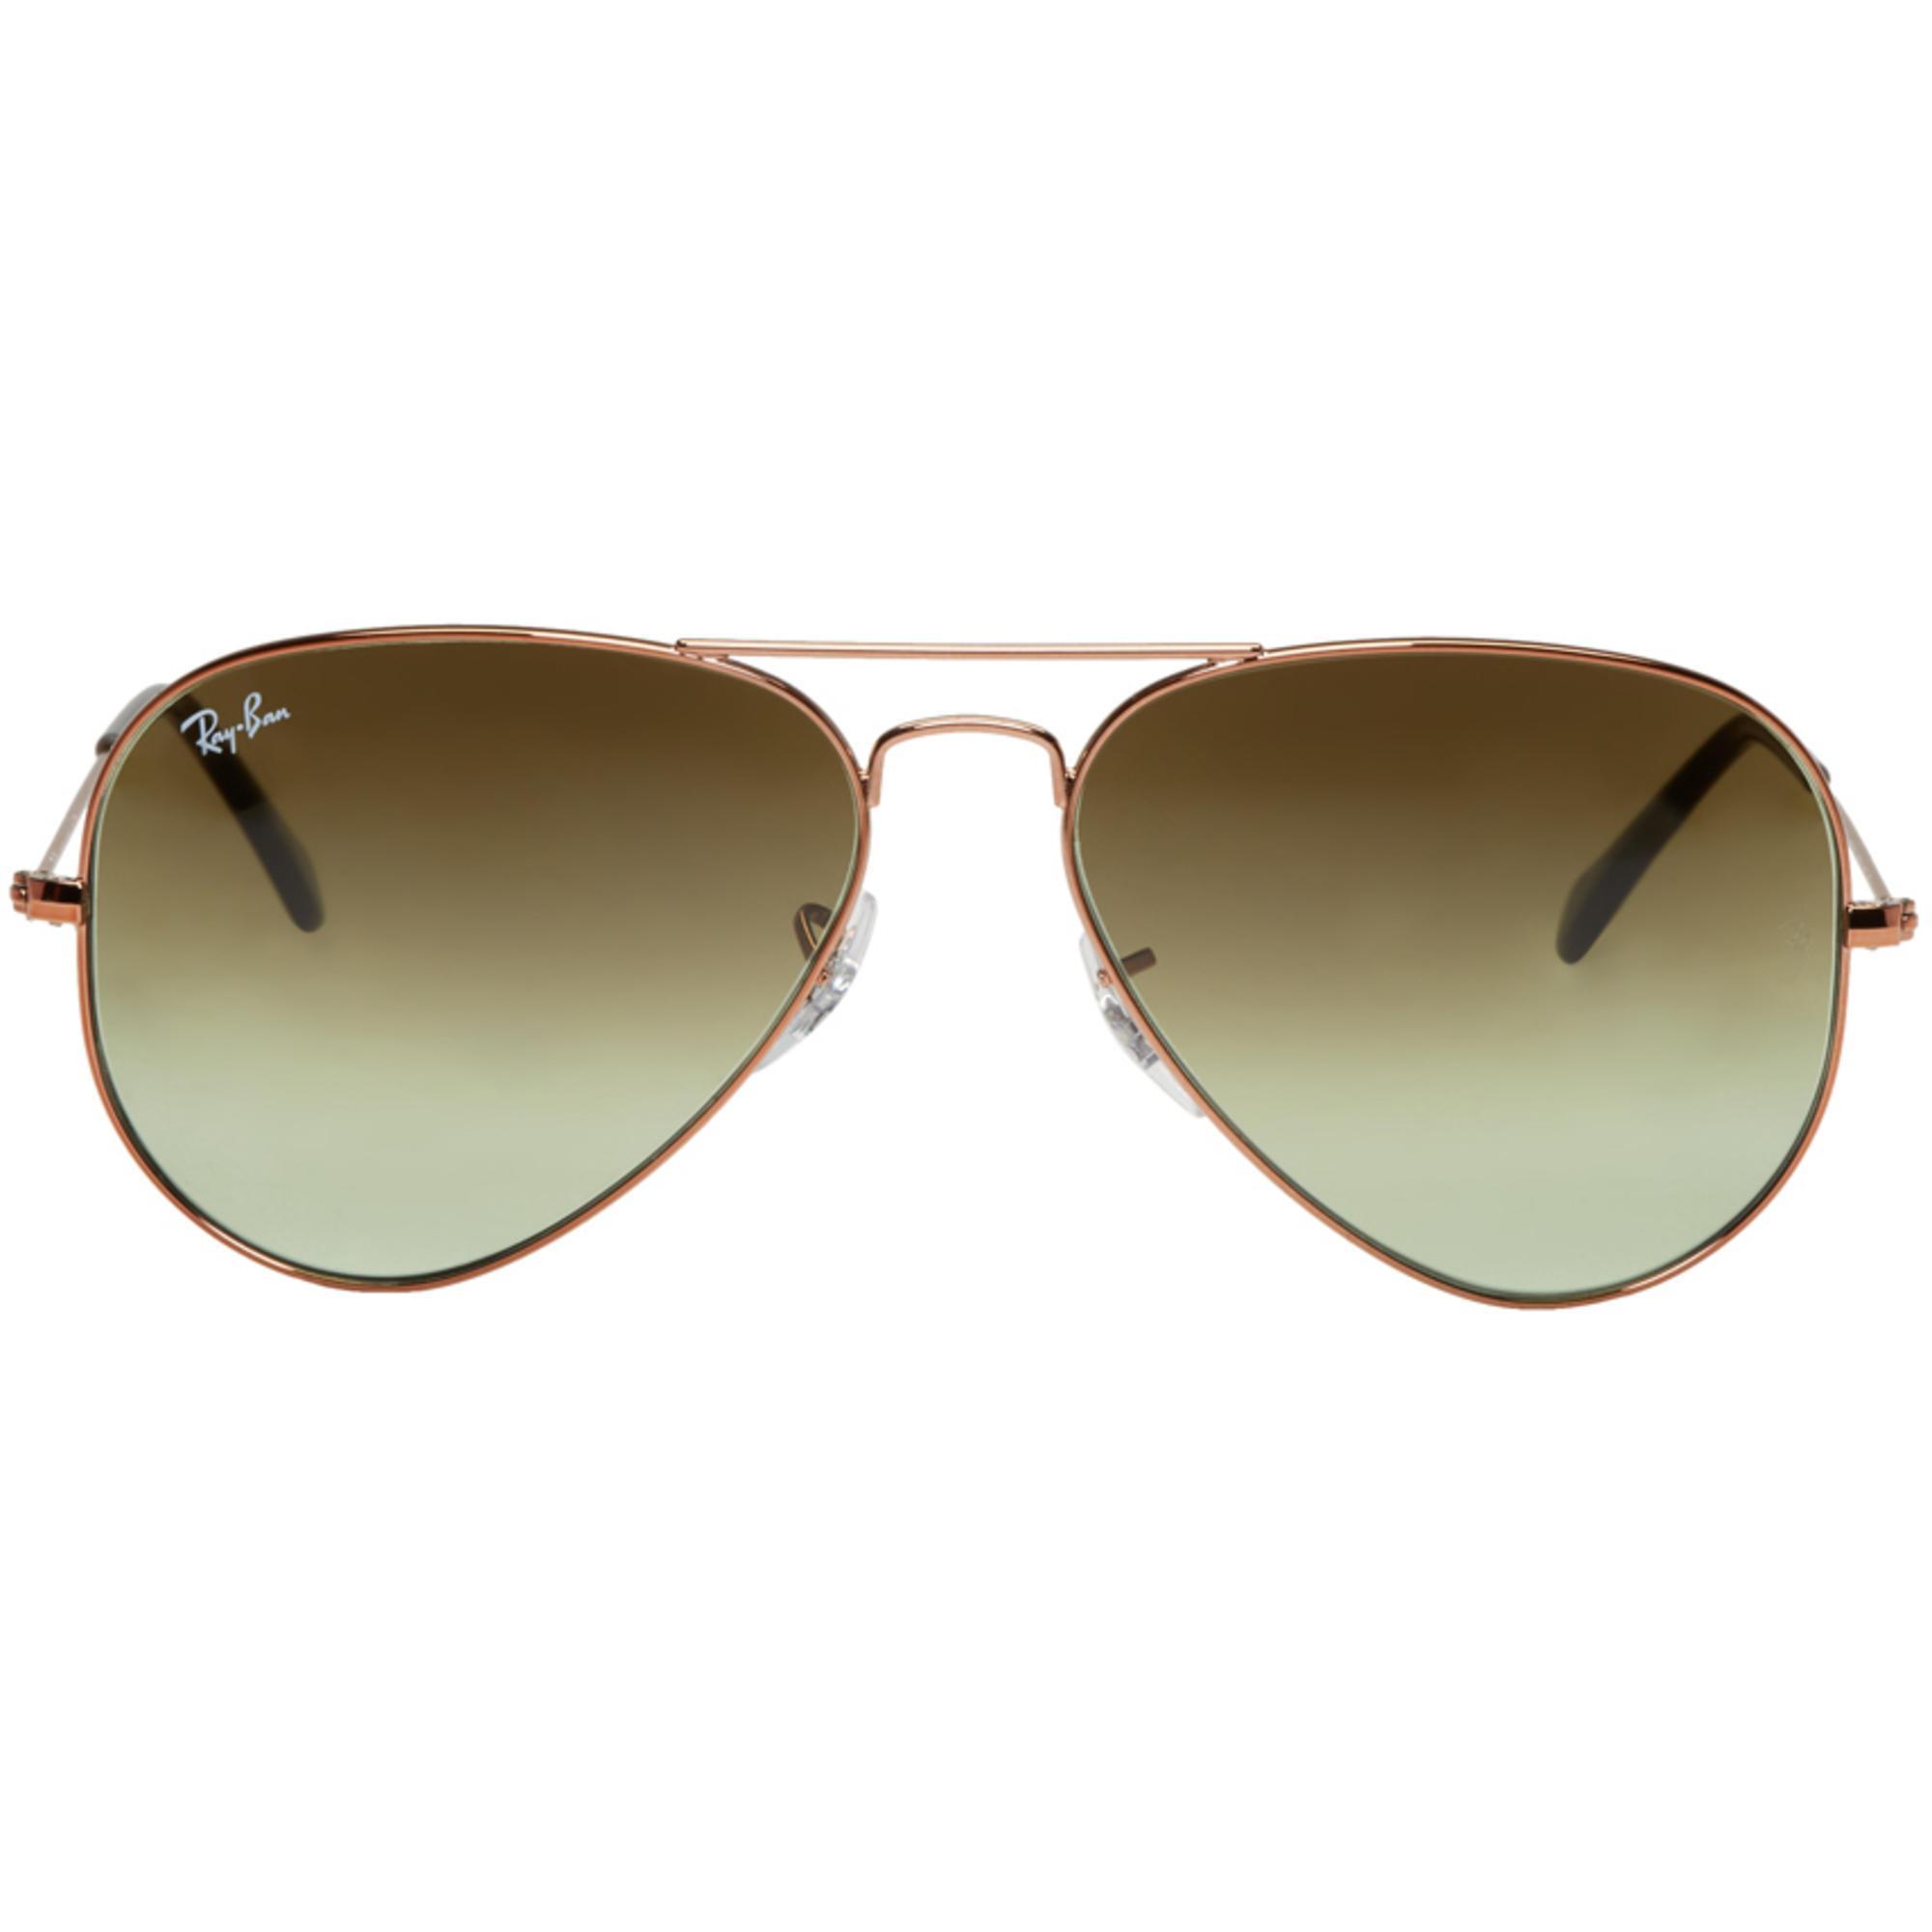 ecc7edb3cd Lyst - Ray-Ban Bronze   Green Gradient Aviator Sunglasses in ...